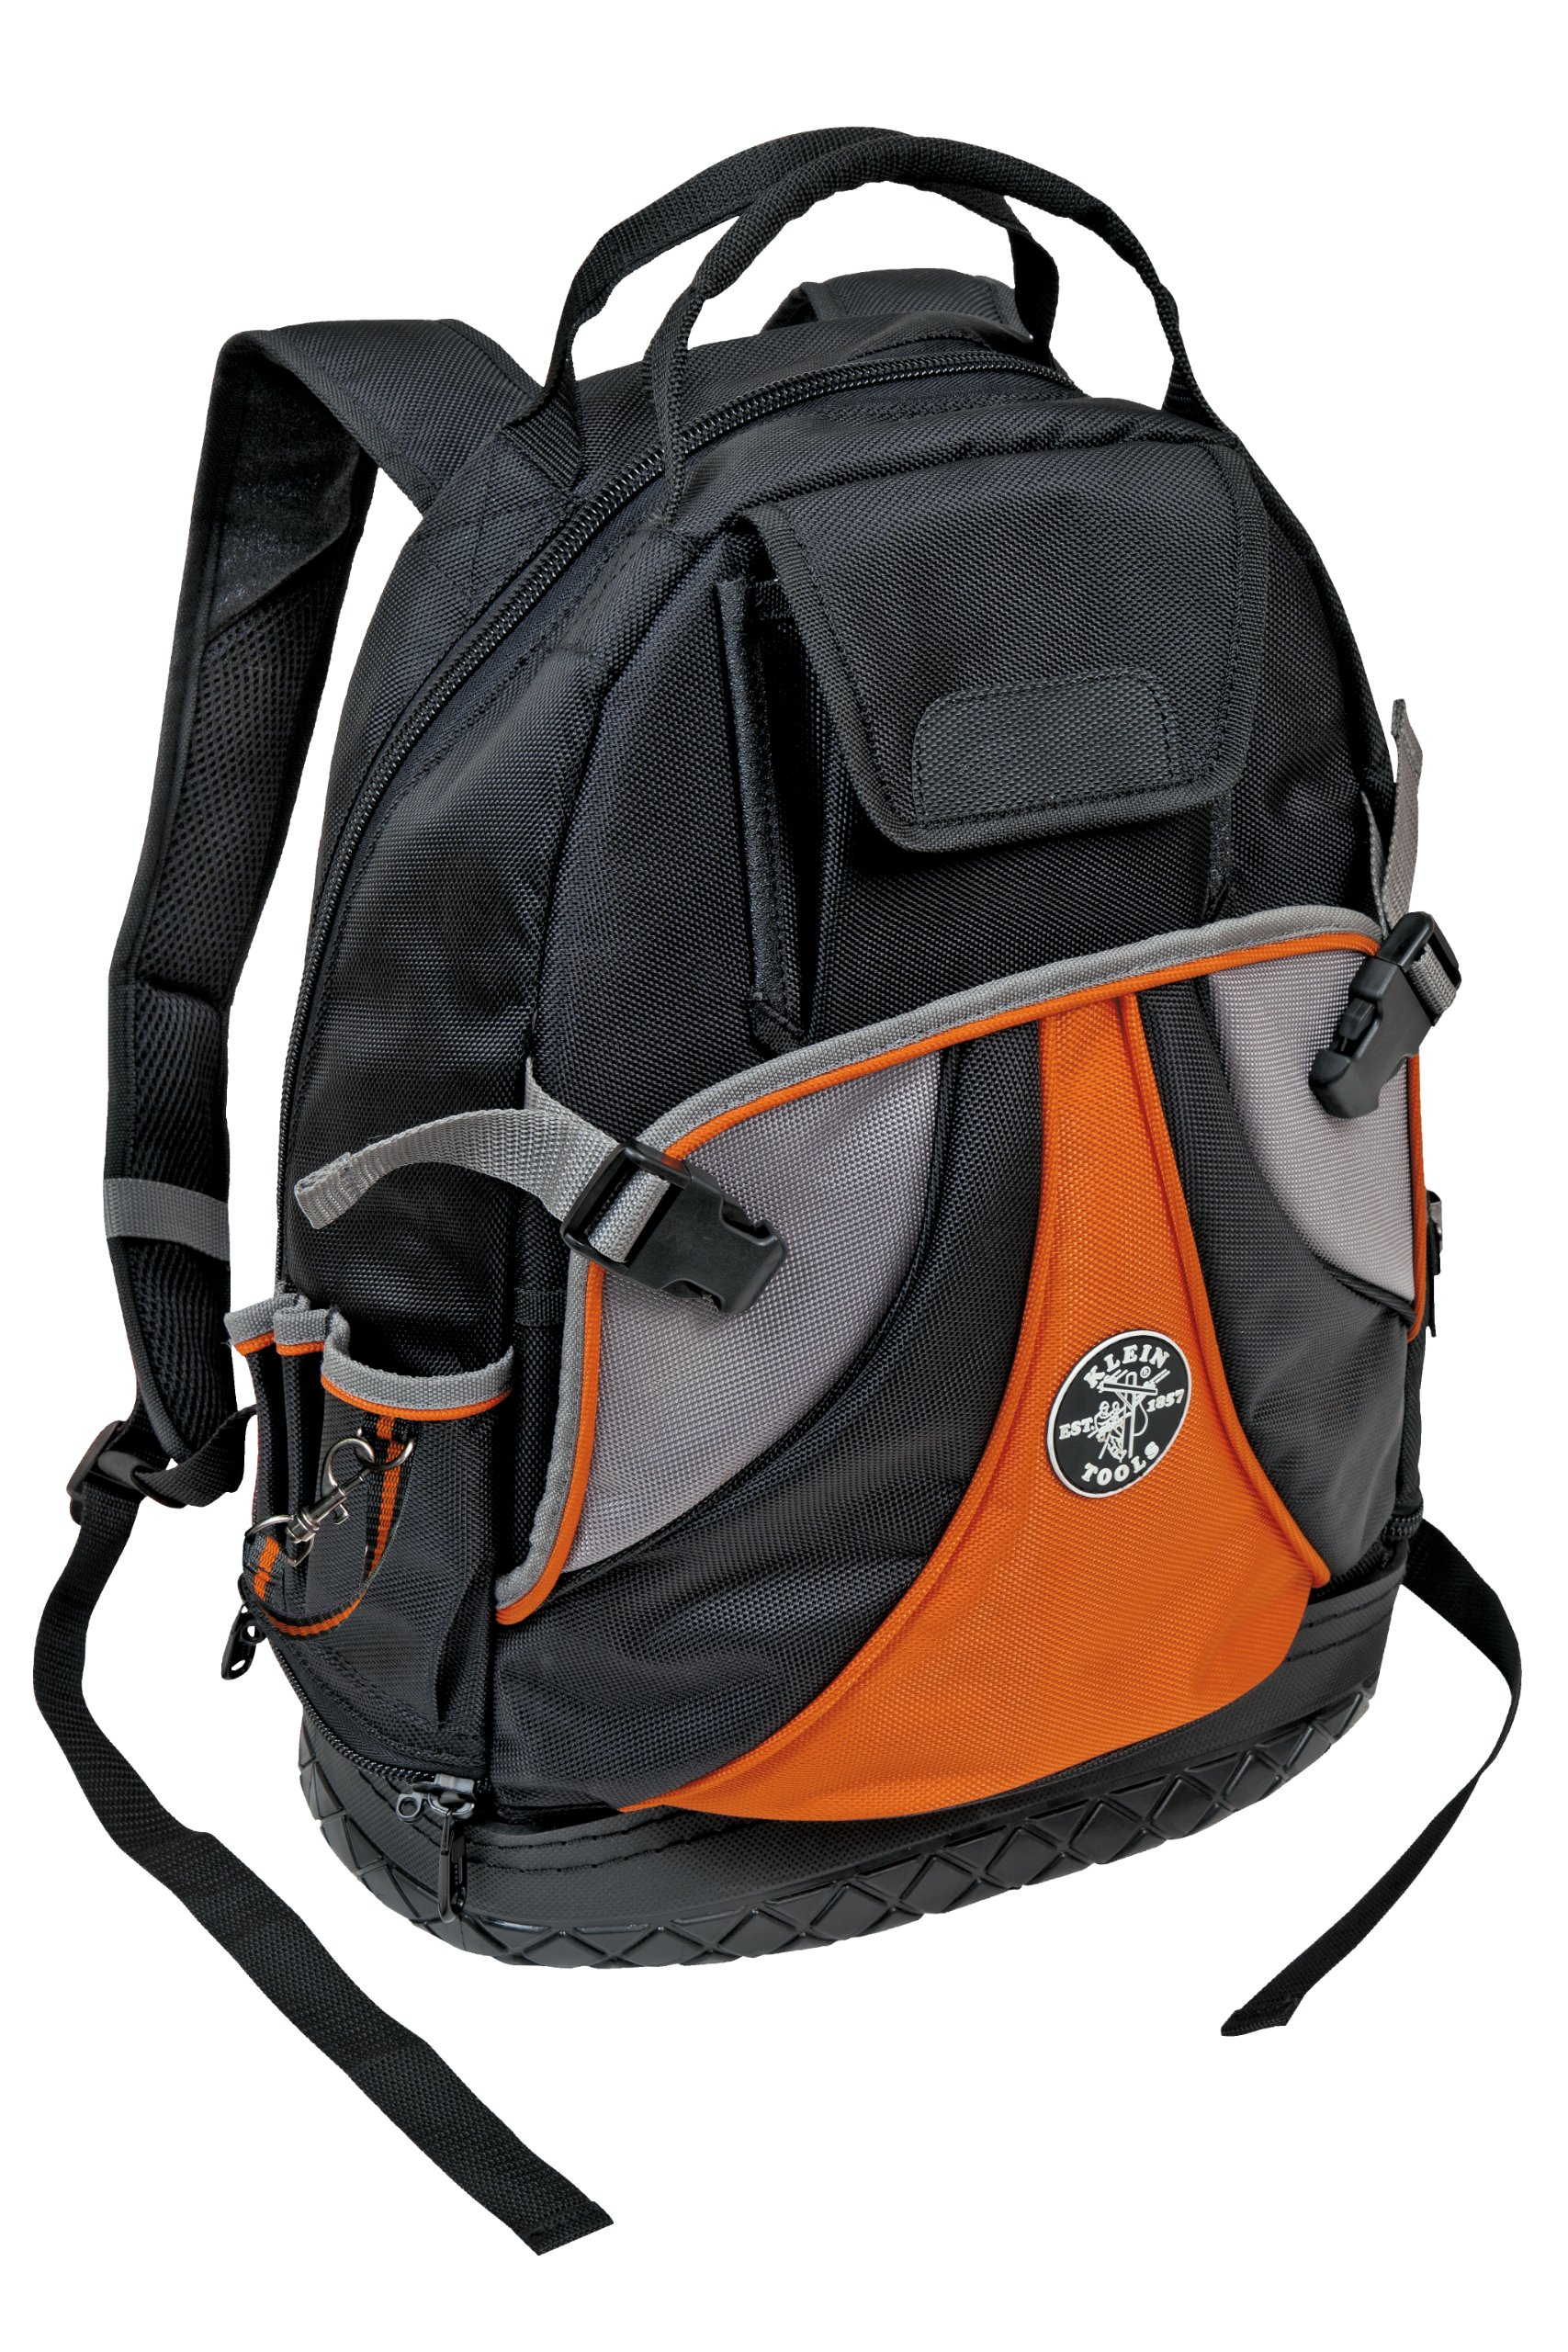 Klein Tools 55421-BP Tradesman Pro Organizer Backpack product image